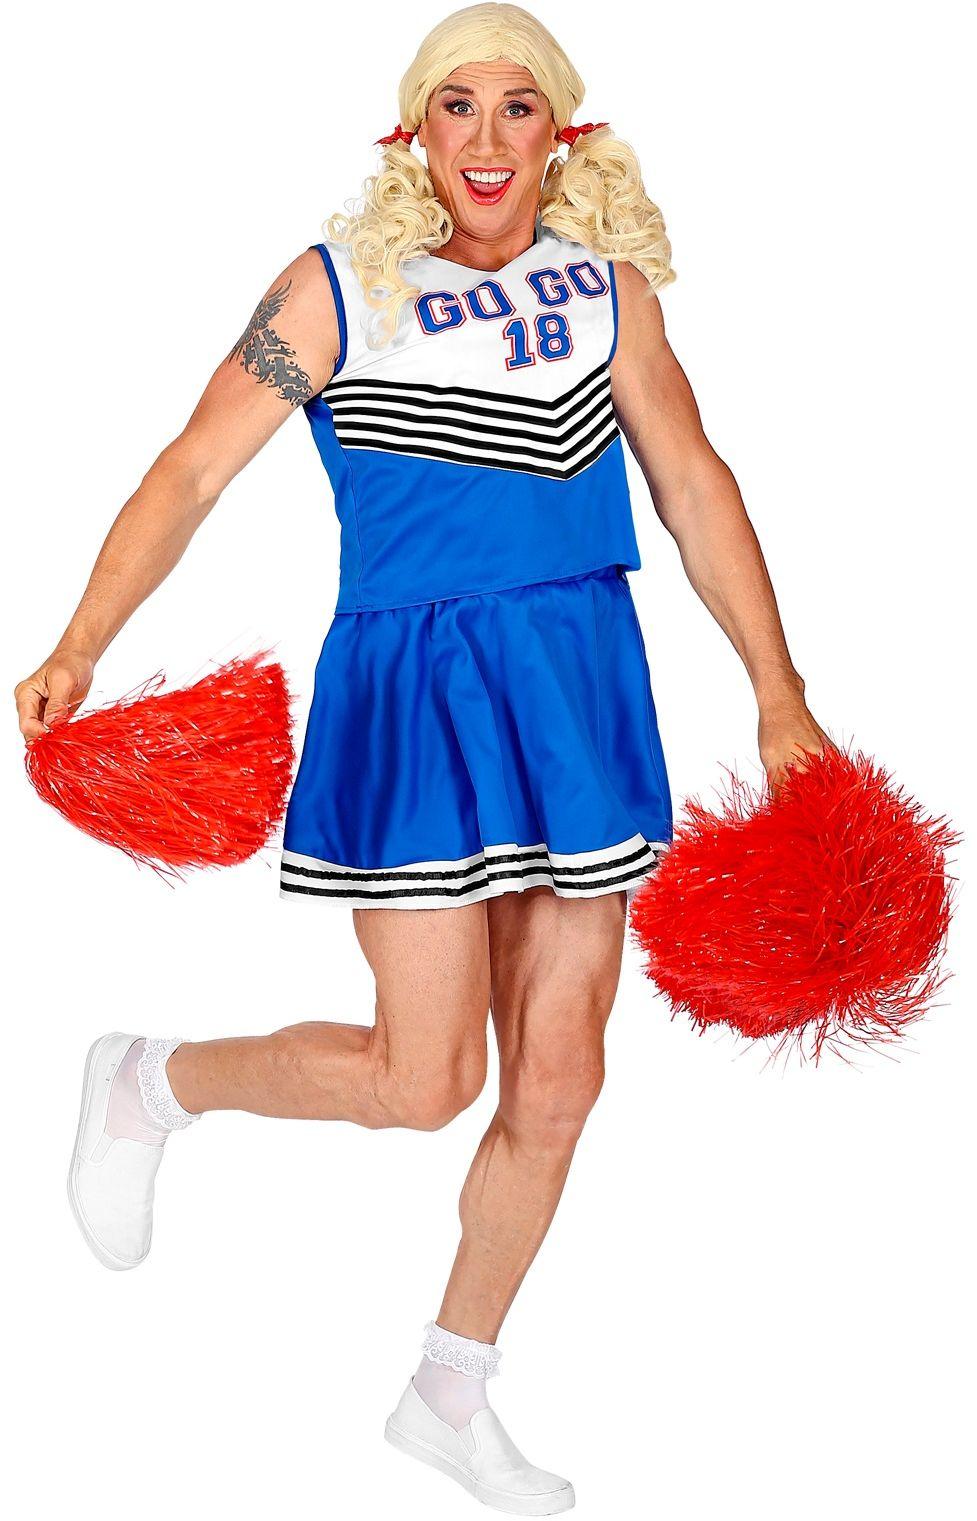 Cheerleader travestie kostuum